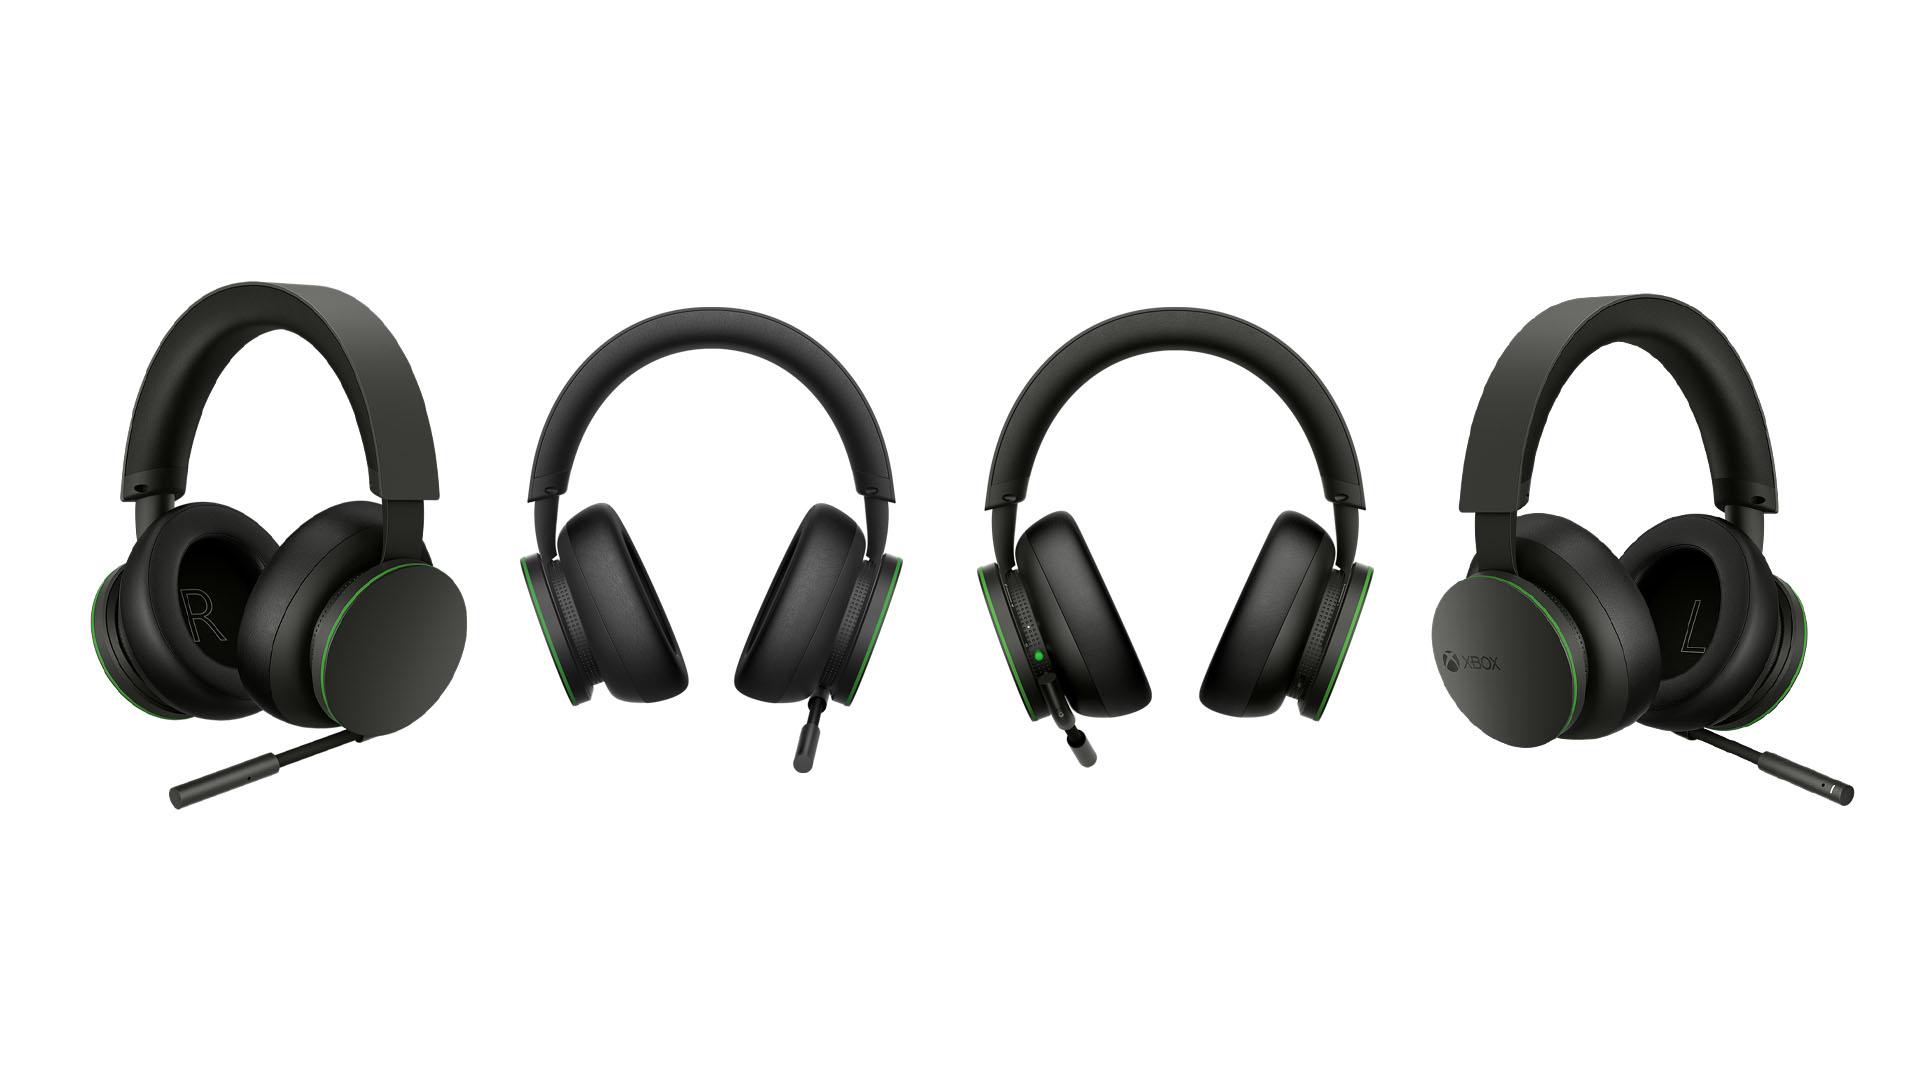 Xbox Wireless Headset - Auriculares inalámbricos para gaming, Automute, Color Negro, 15 horas de autonomía, tecnologías Spatial Sound como Windows Sonic, Dolby Atmos y DTS Headphone:X